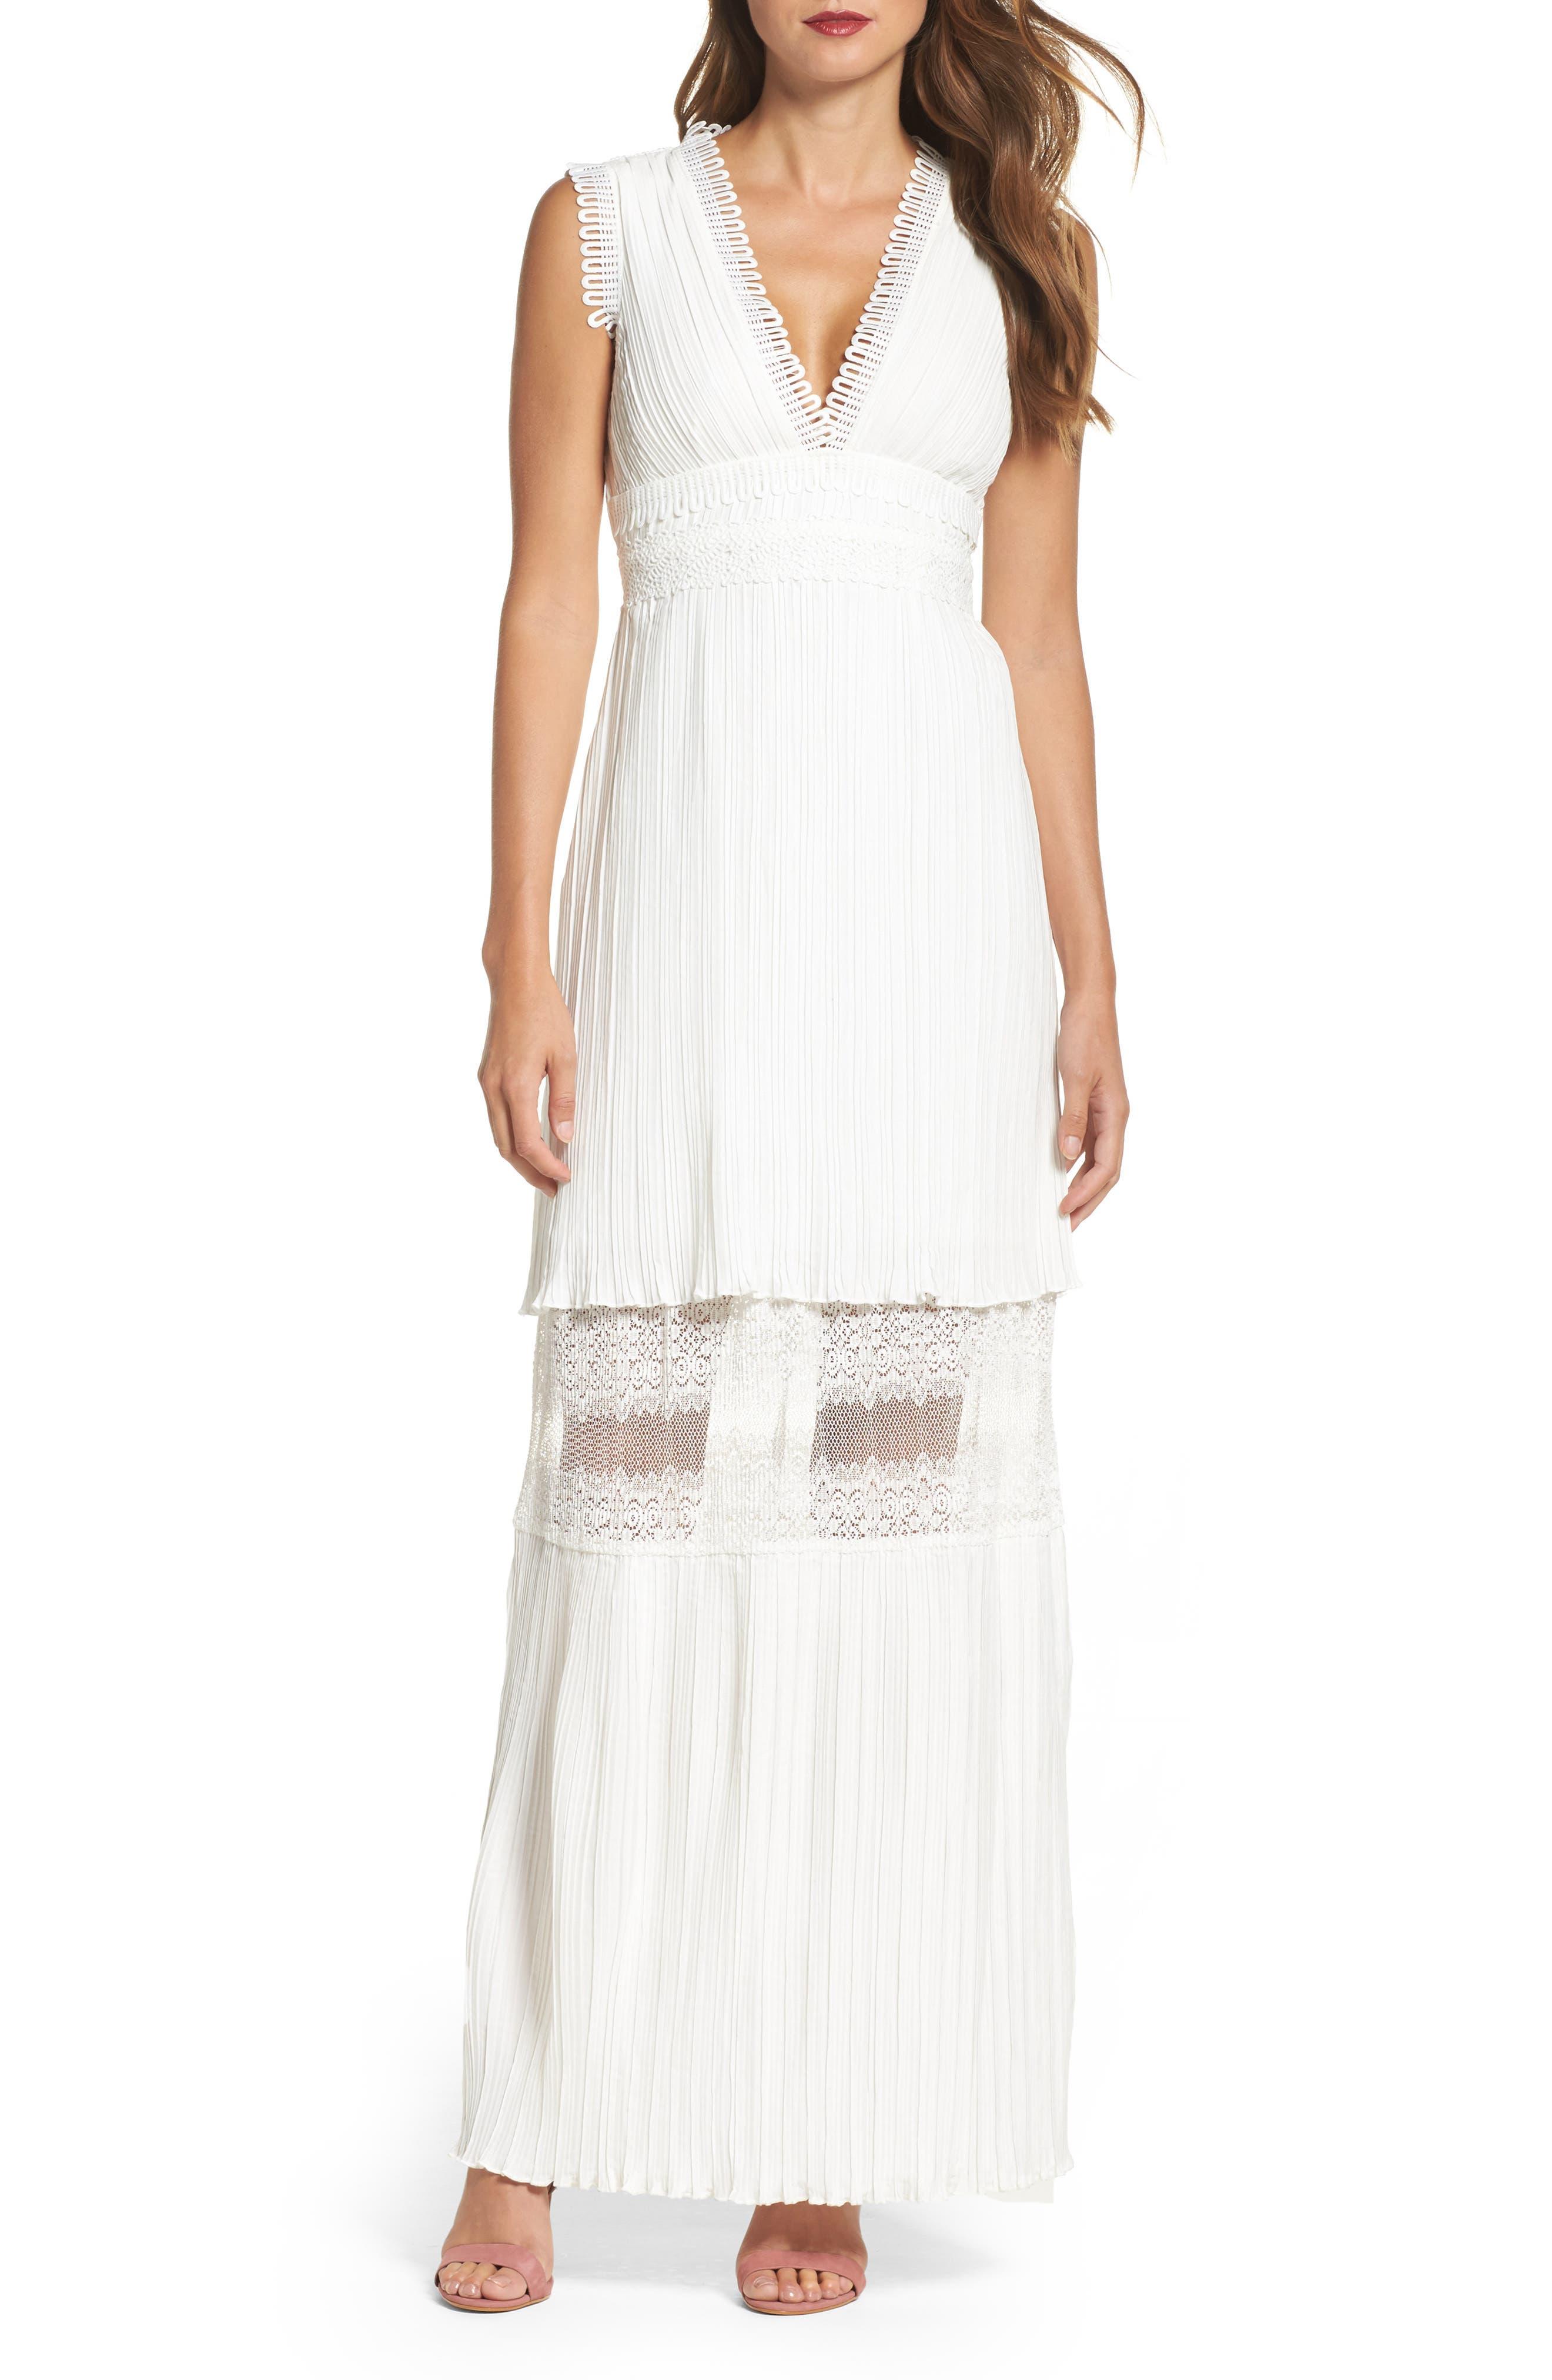 Jasmine Lace Inset Pleated Dress,                             Main thumbnail 1, color,                             Ivory